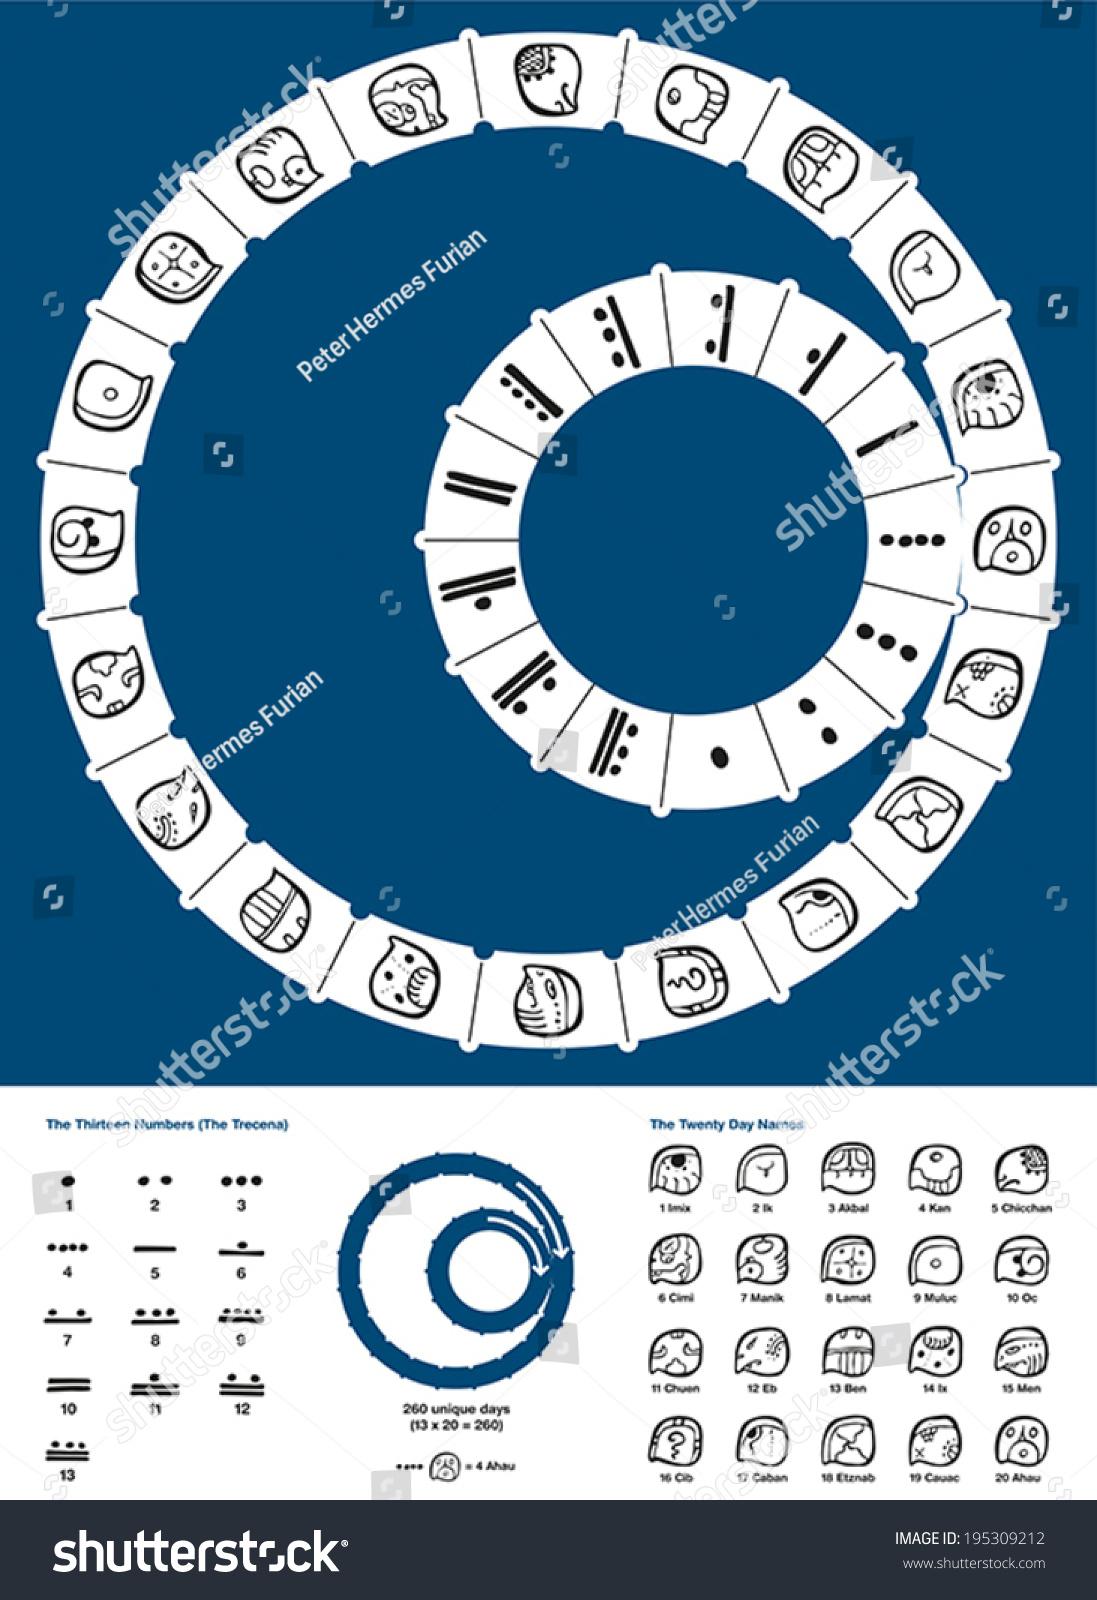 Tzolkin maya calendar 260day mesoamerican calendar stock vector tzolkin maya calendar the 260 day mesoamerican calendar originated by the maya civilization of buycottarizona